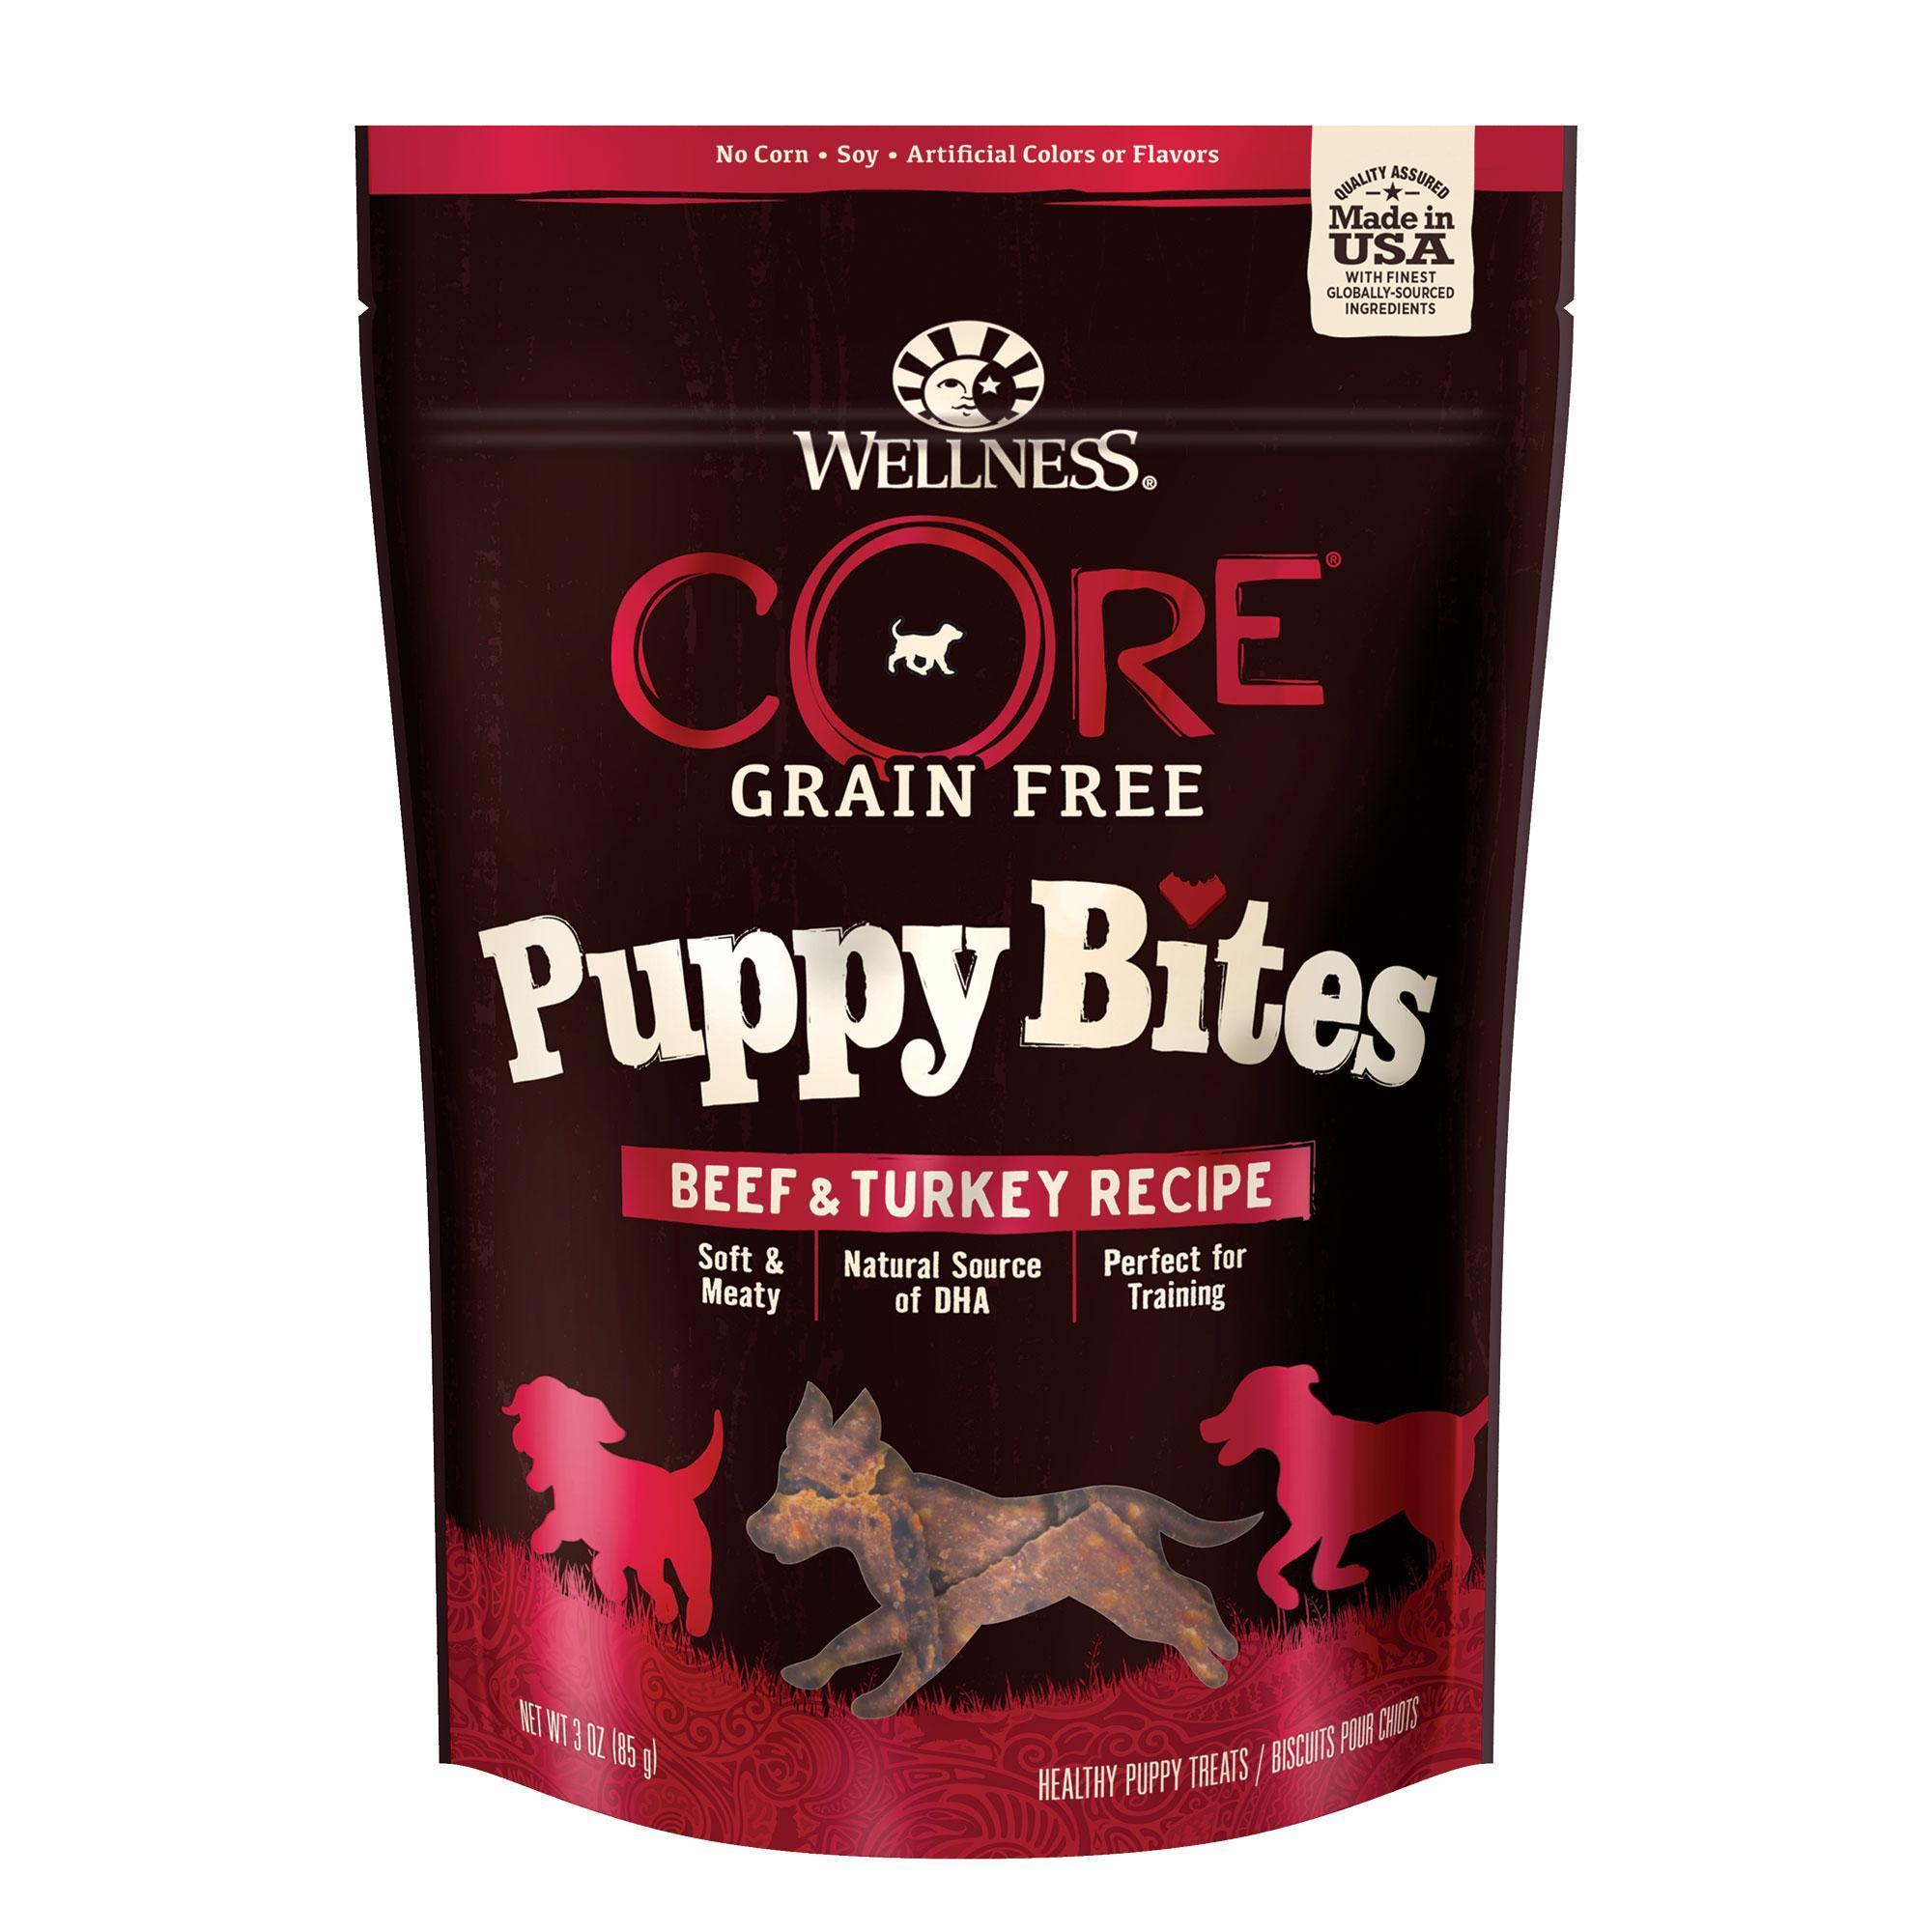 Wellness CORE Puppy Bites Beef & Turkey Grain-Free Dog Treats, 3-oz